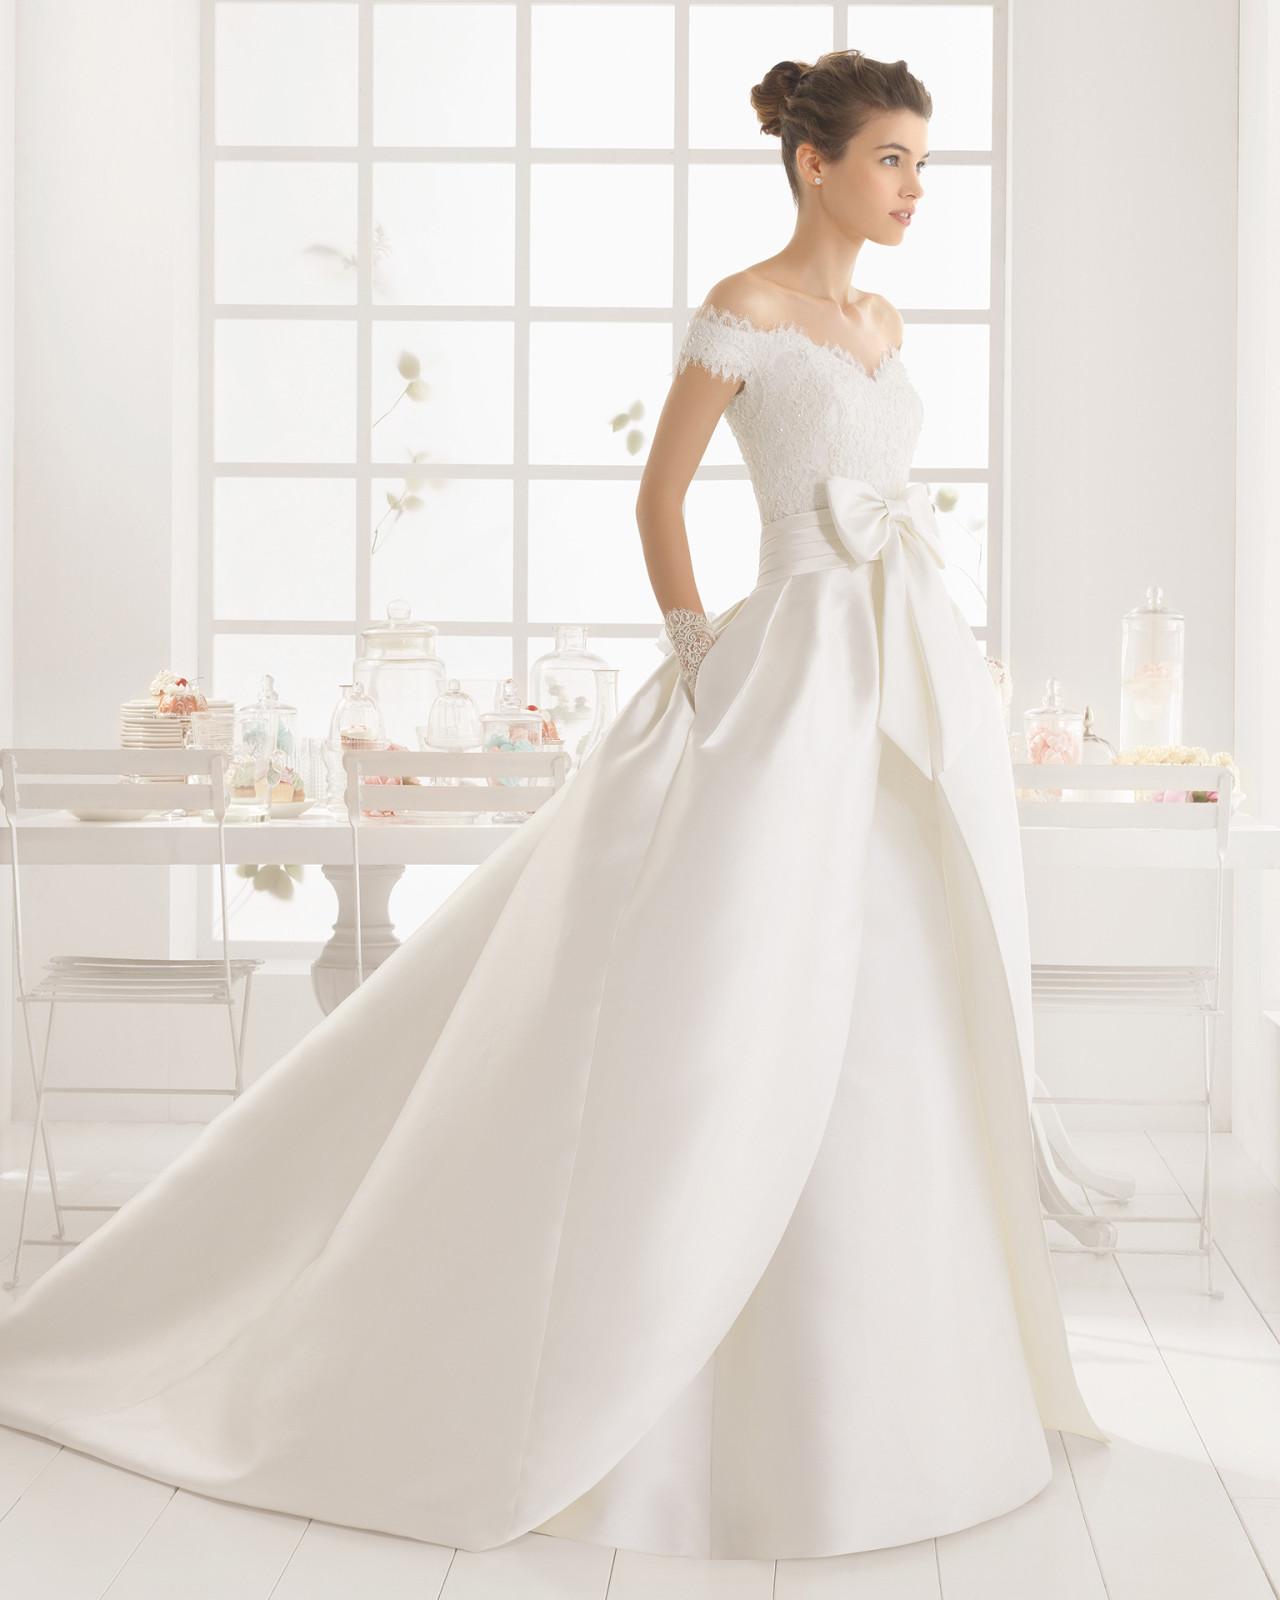 d7b9ddc47a7b Brudekjole i kraftig brudekjolesatin med blonde og fyldigt skørt med langt  slæb